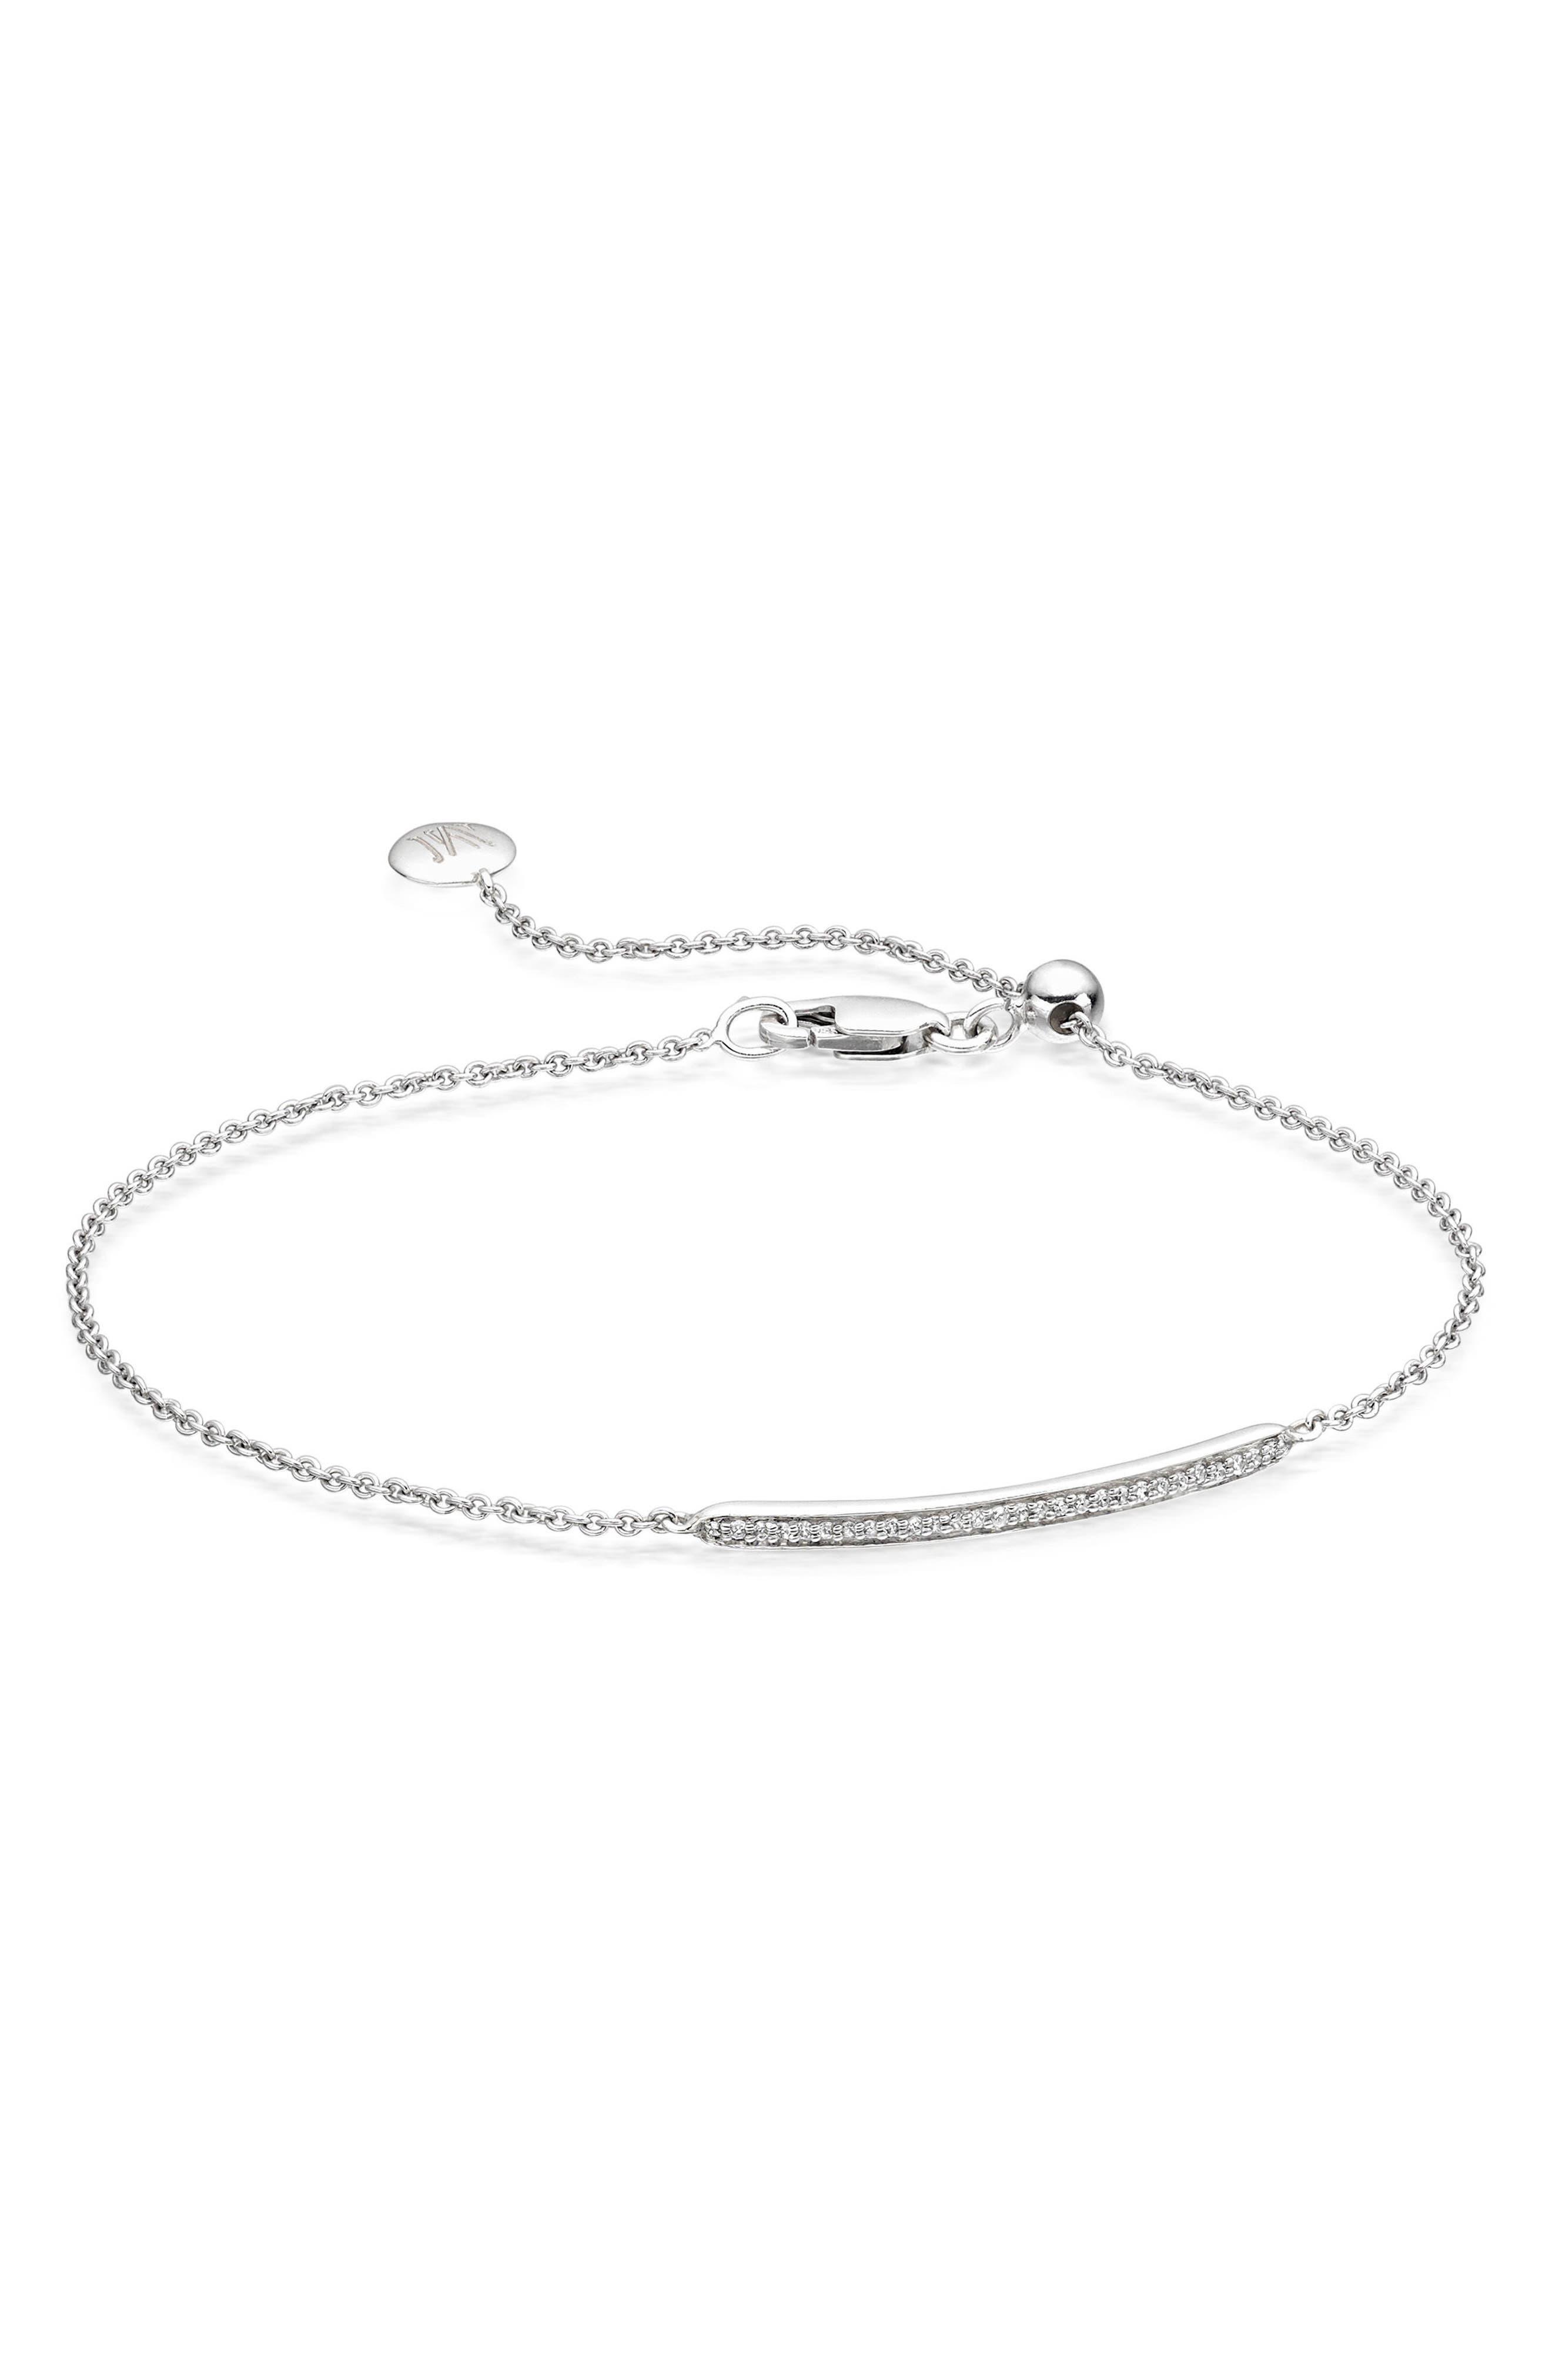 MONICA VINADER Skinny Diamond Bracelet, Main, color, SILVER/ DIAMOND